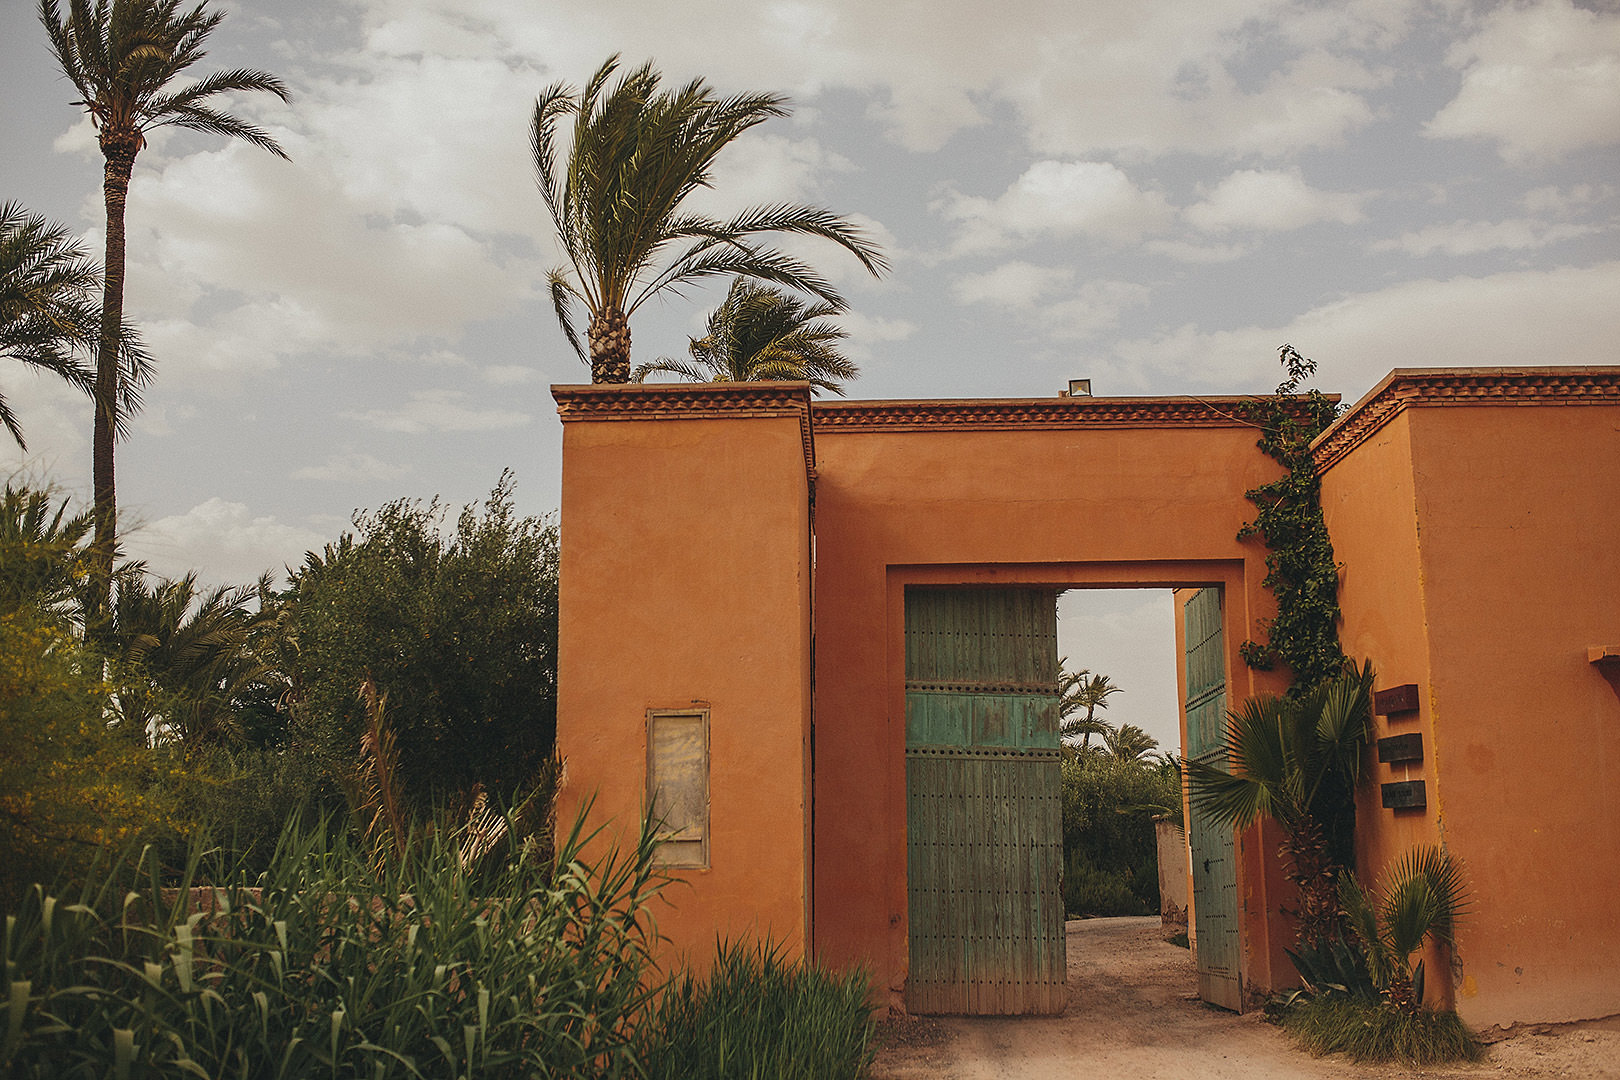 jnane tamsna Marrakech